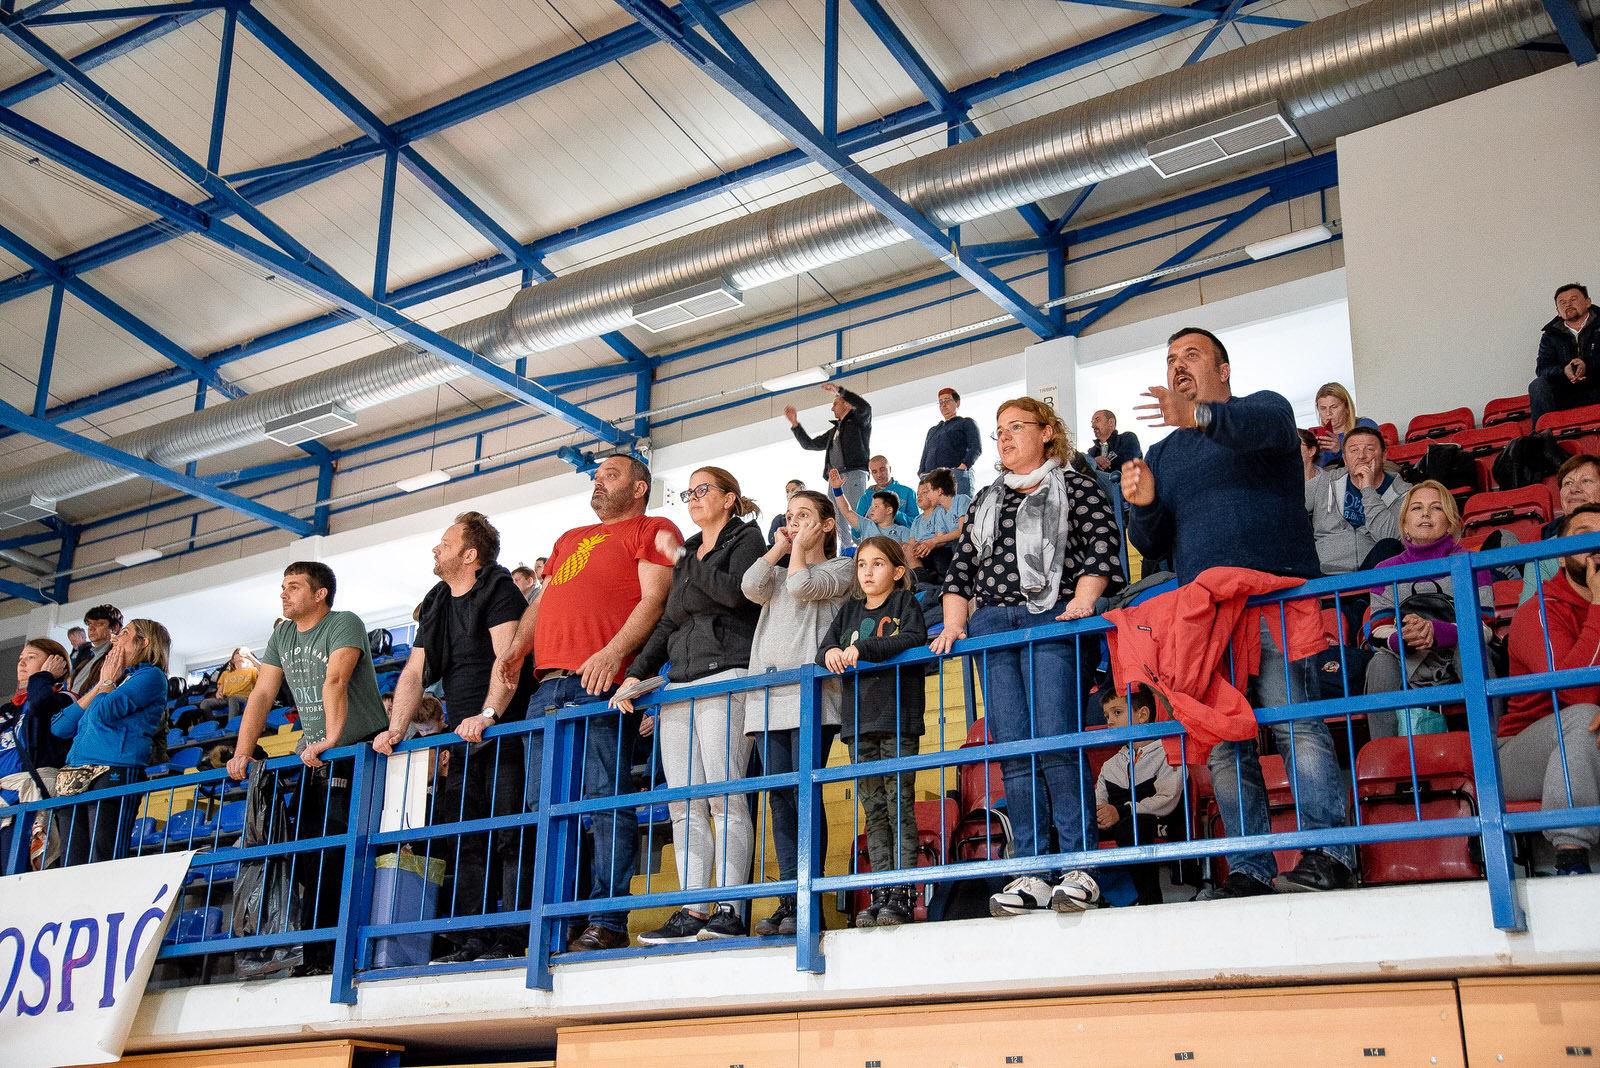 likaclub_rk gospić_turnir mali medo_2020 (35)